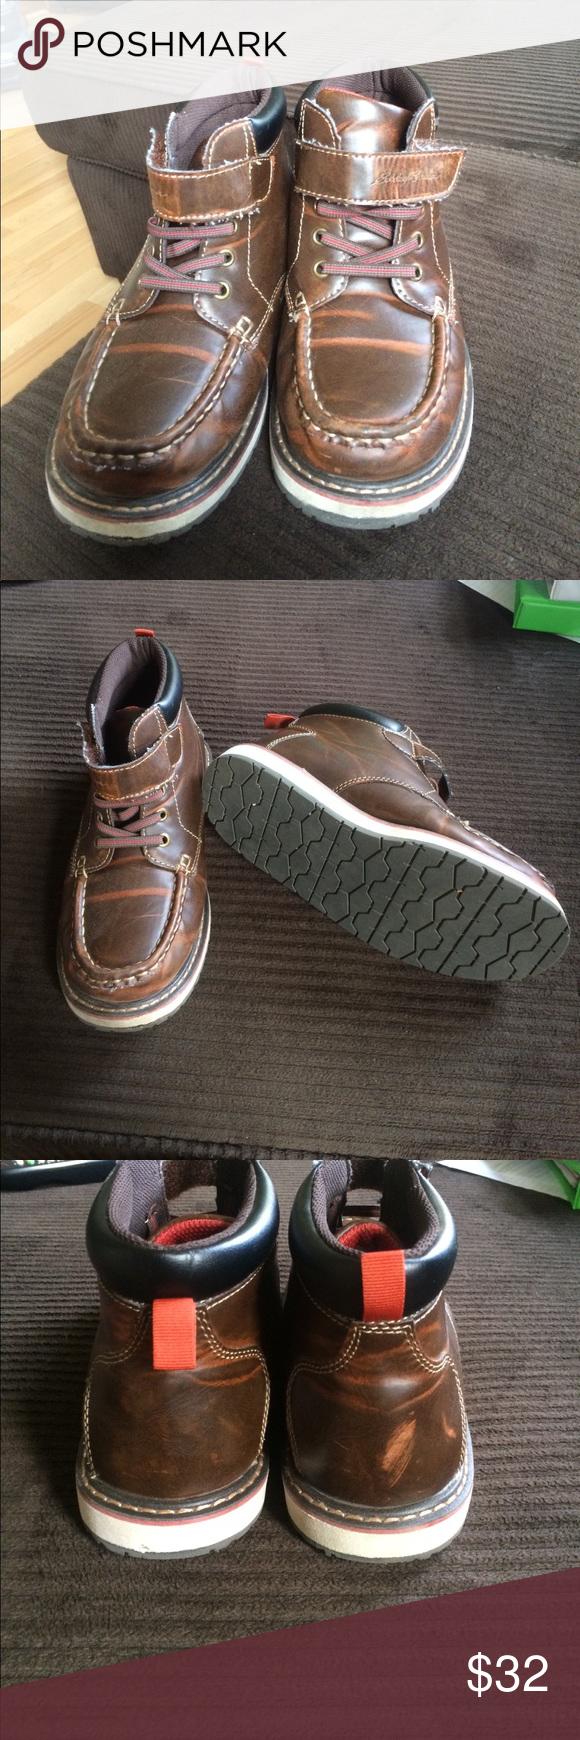 Eddie Bauer Size 3 like New Eddie Bauer Shoes Boots Shoe